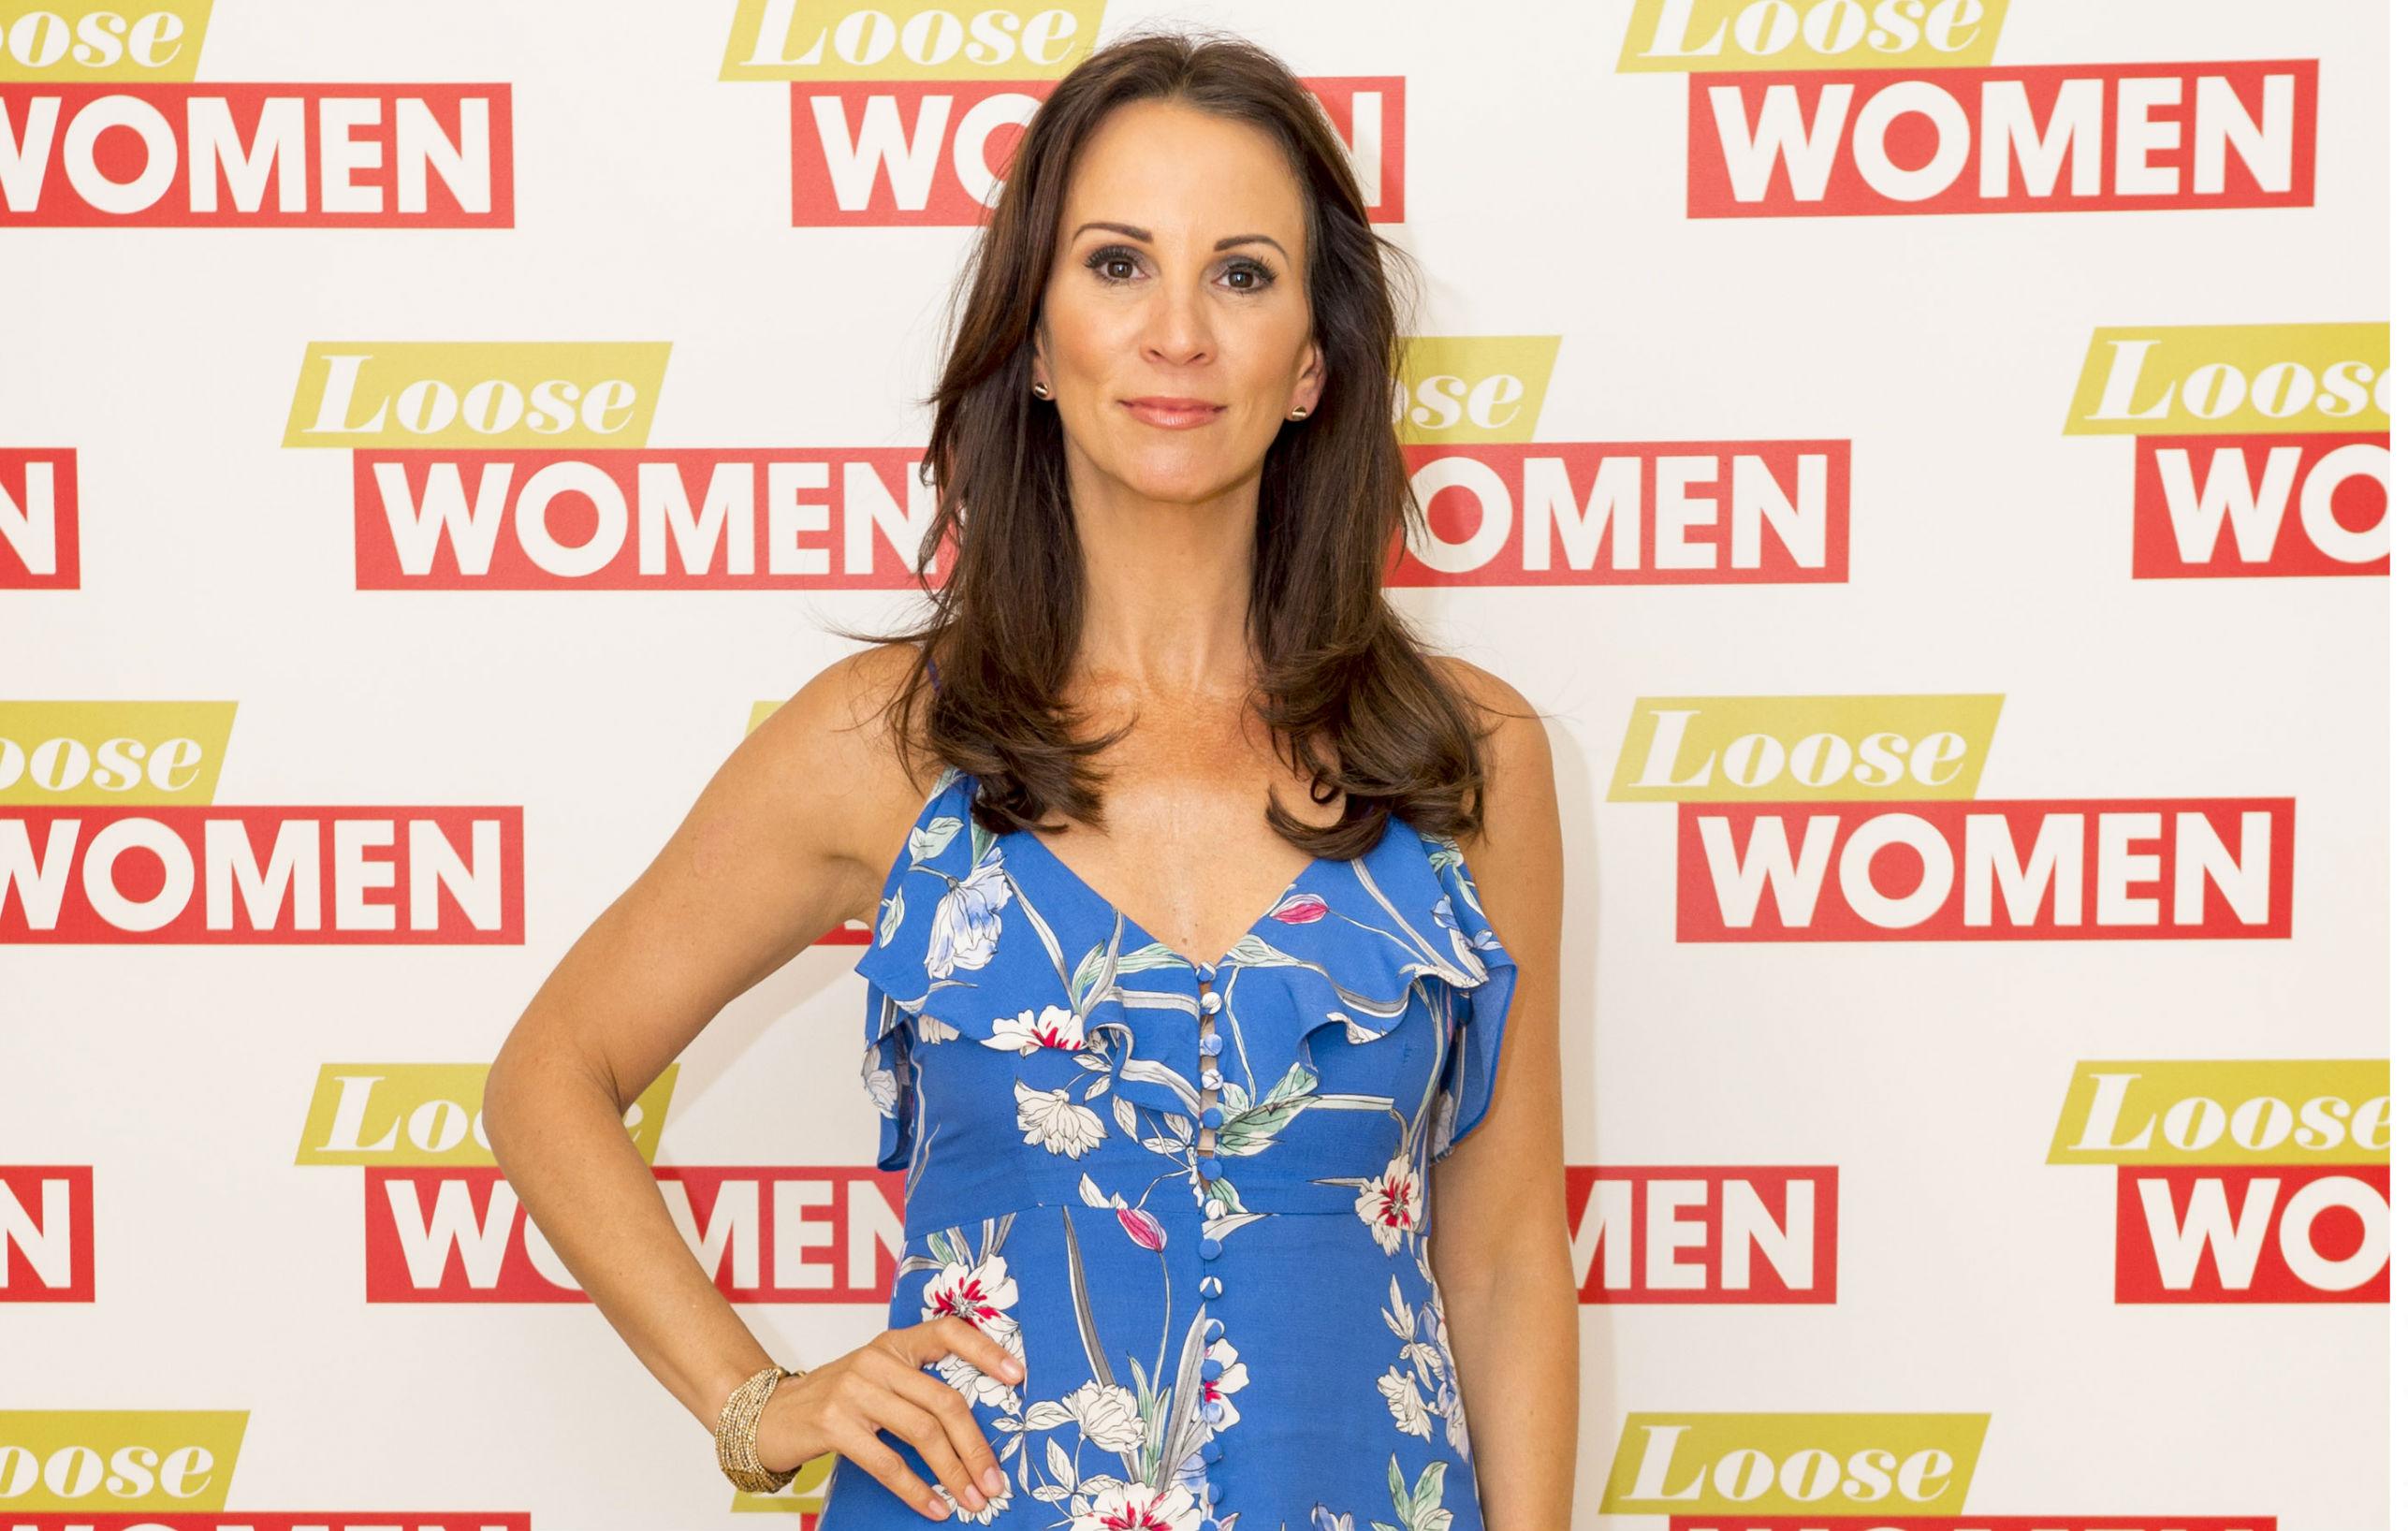 Andrea McLean, Loose Women